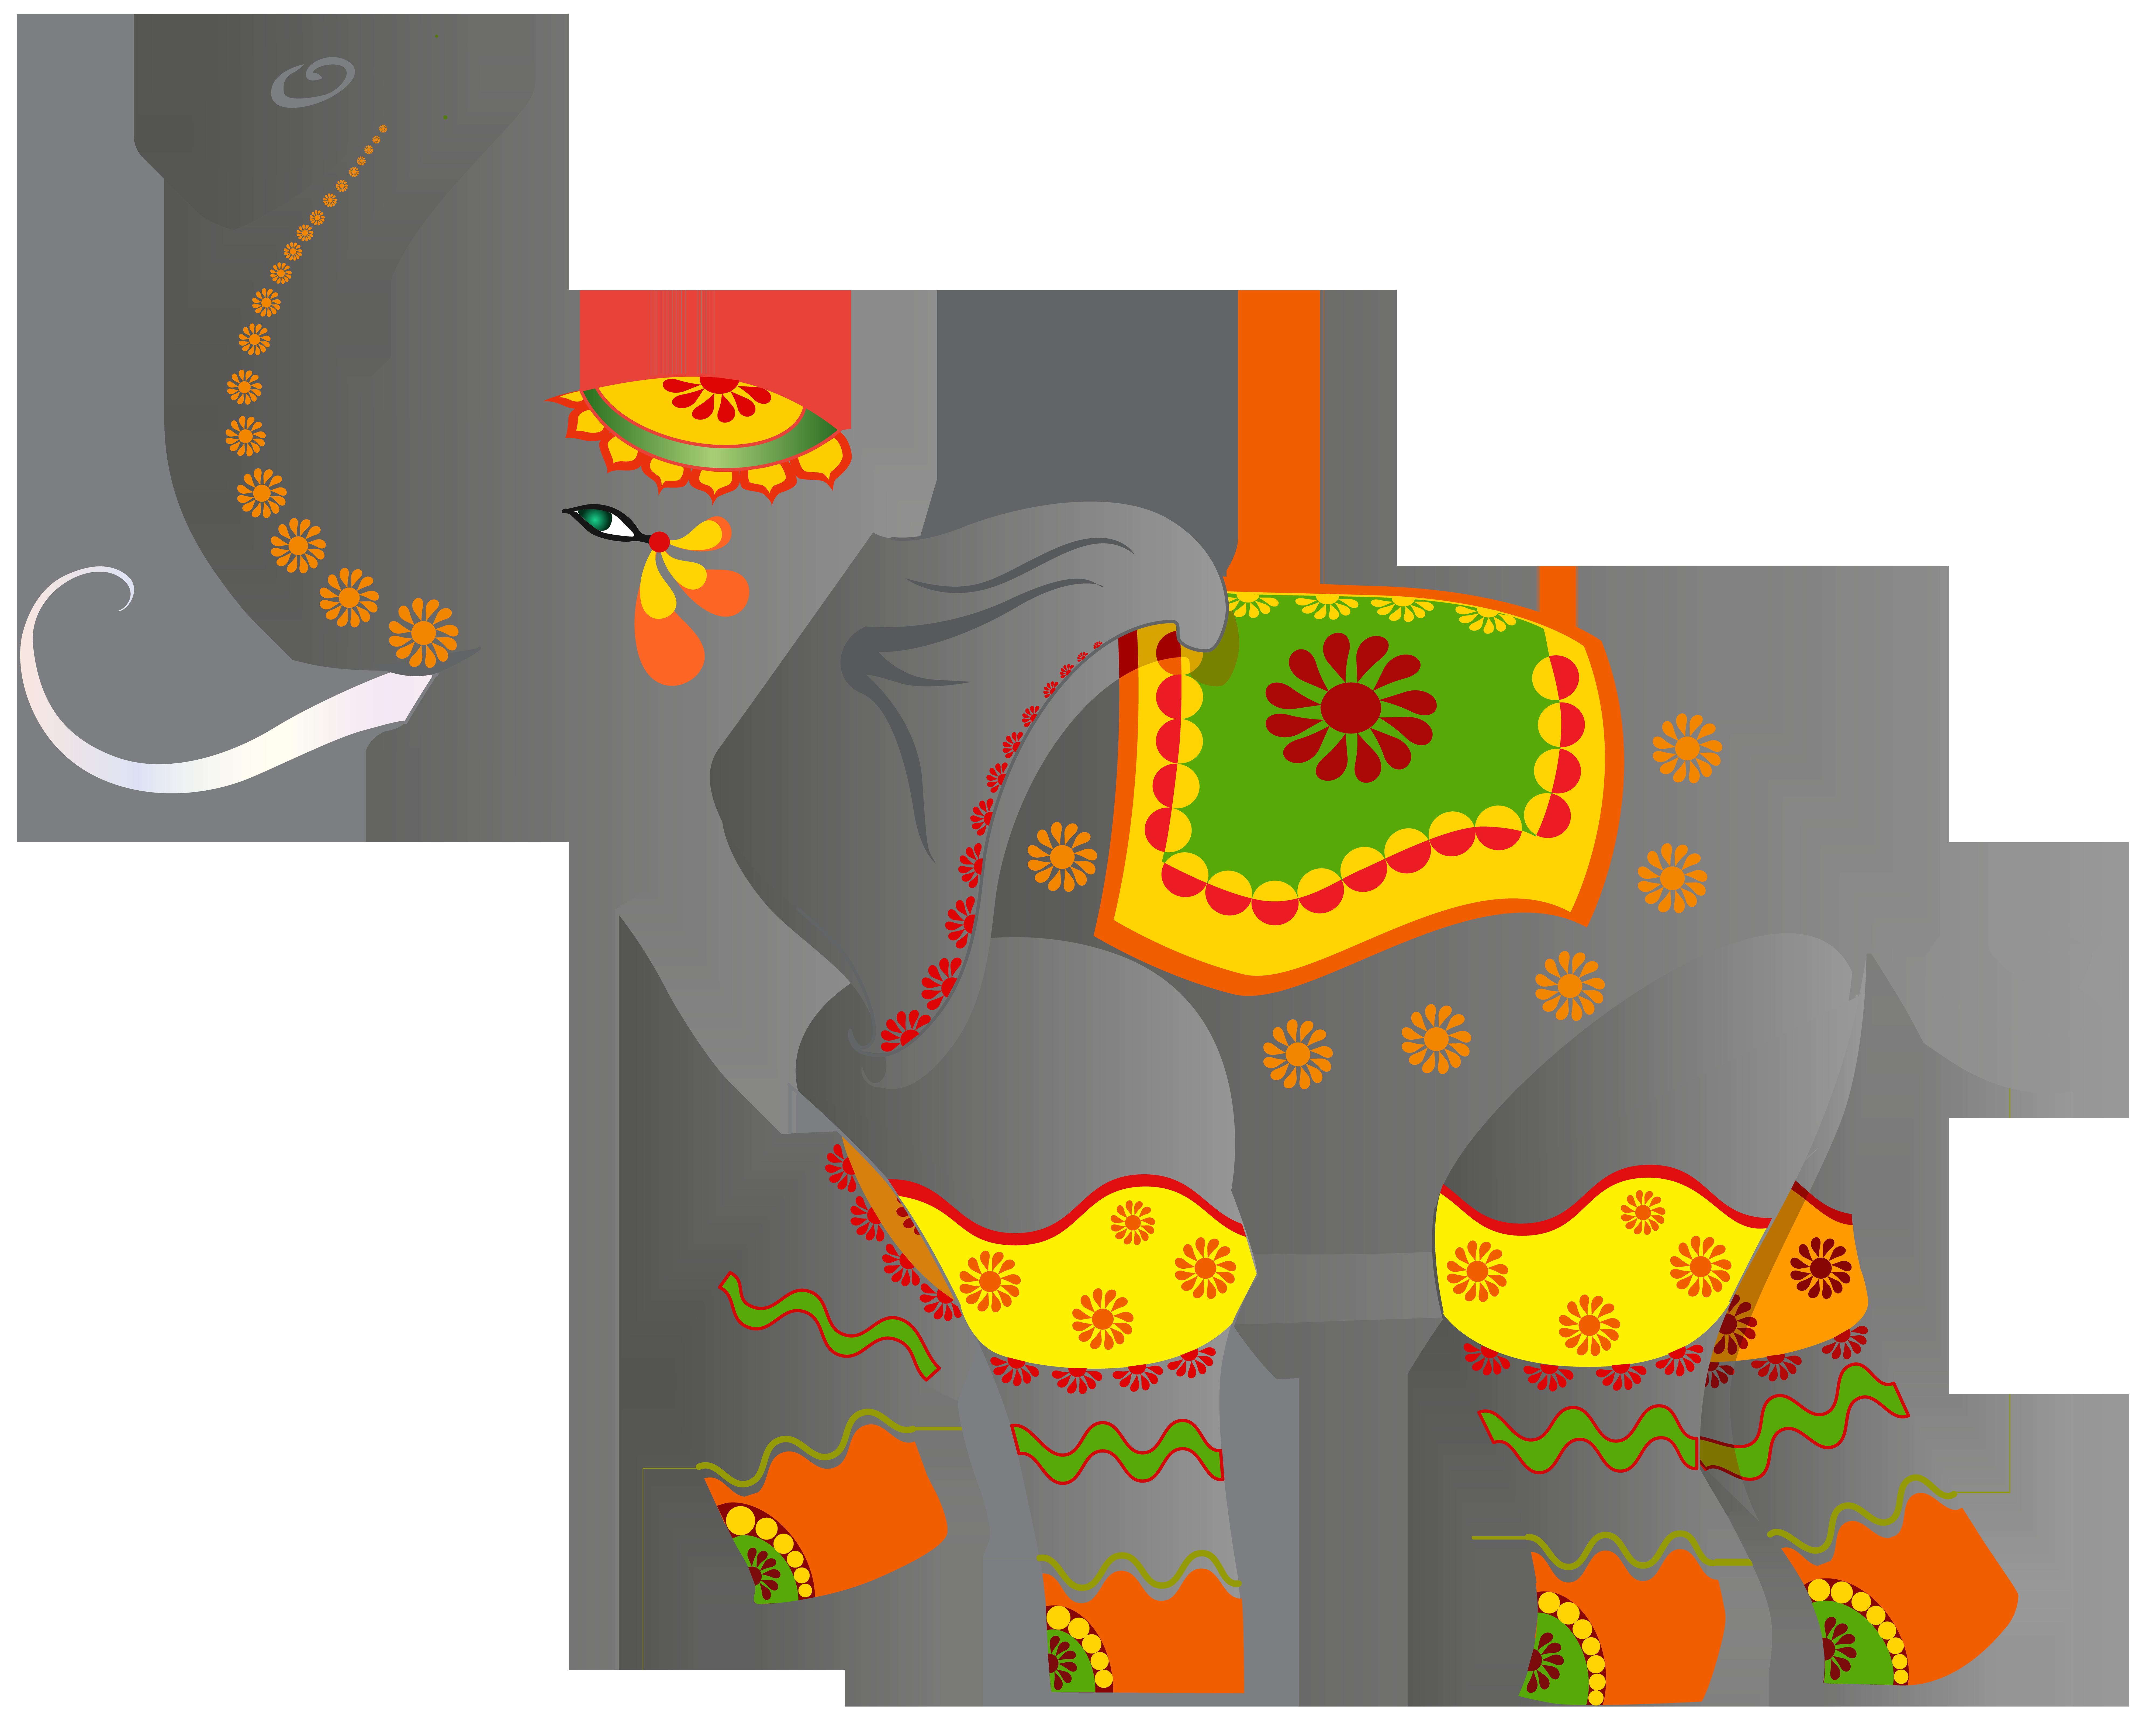 8000x6357 Decorative Indian Elephant Png Clip Art Imageu200b Gallery